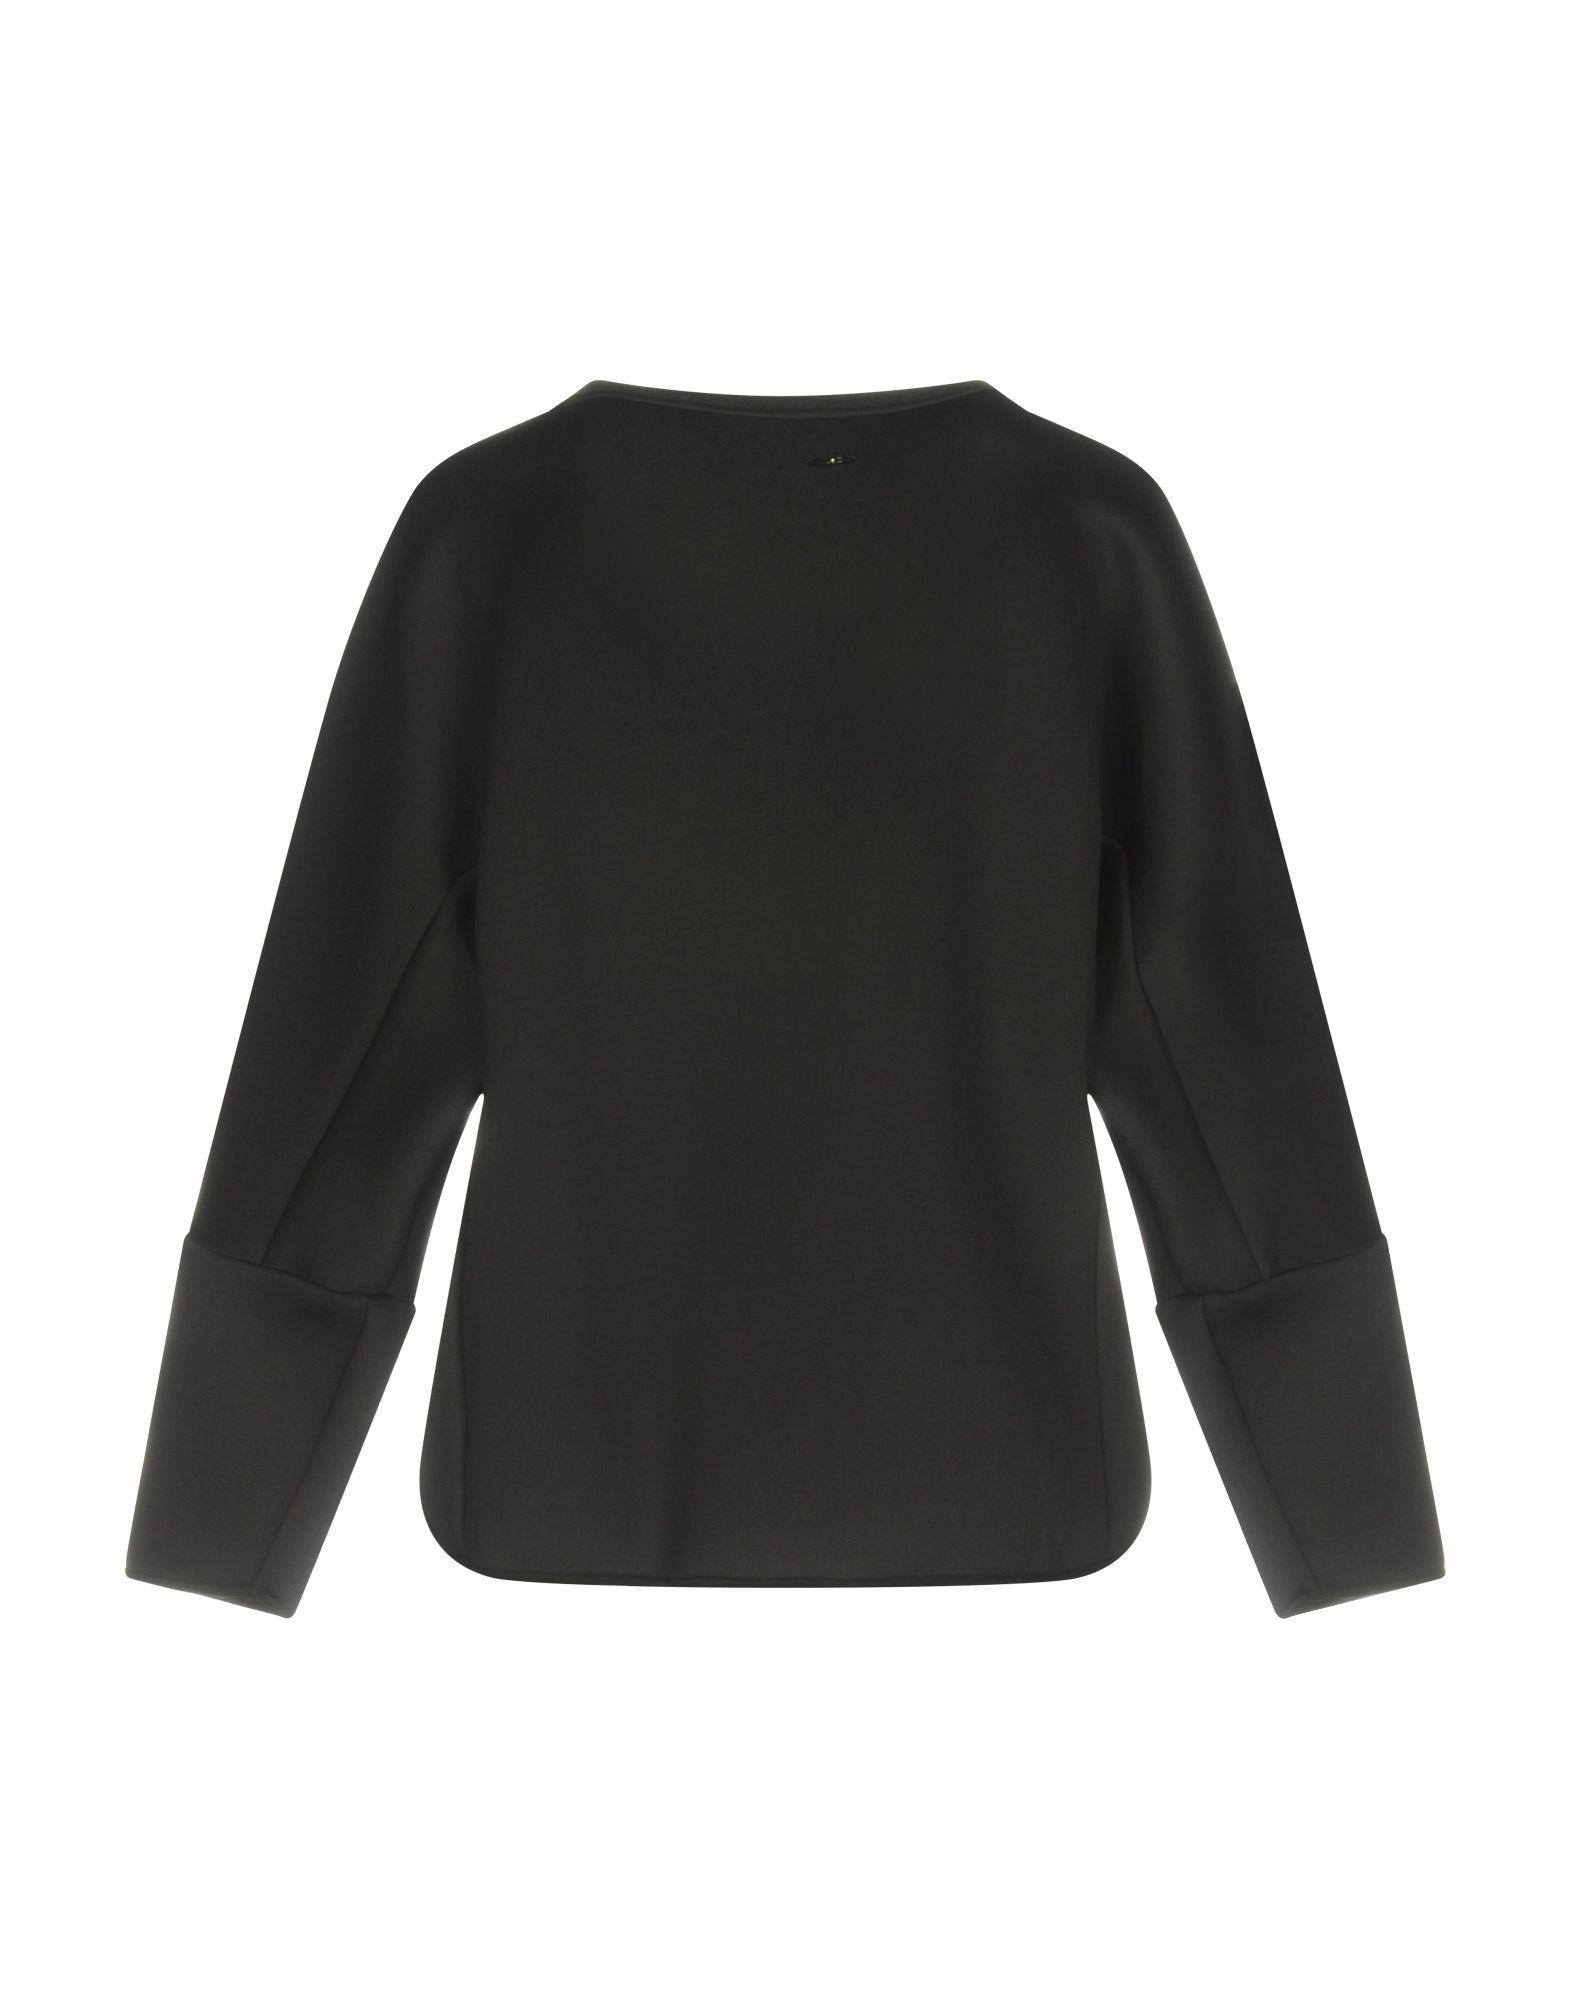 Liu Jo Black Long Sleeve Top